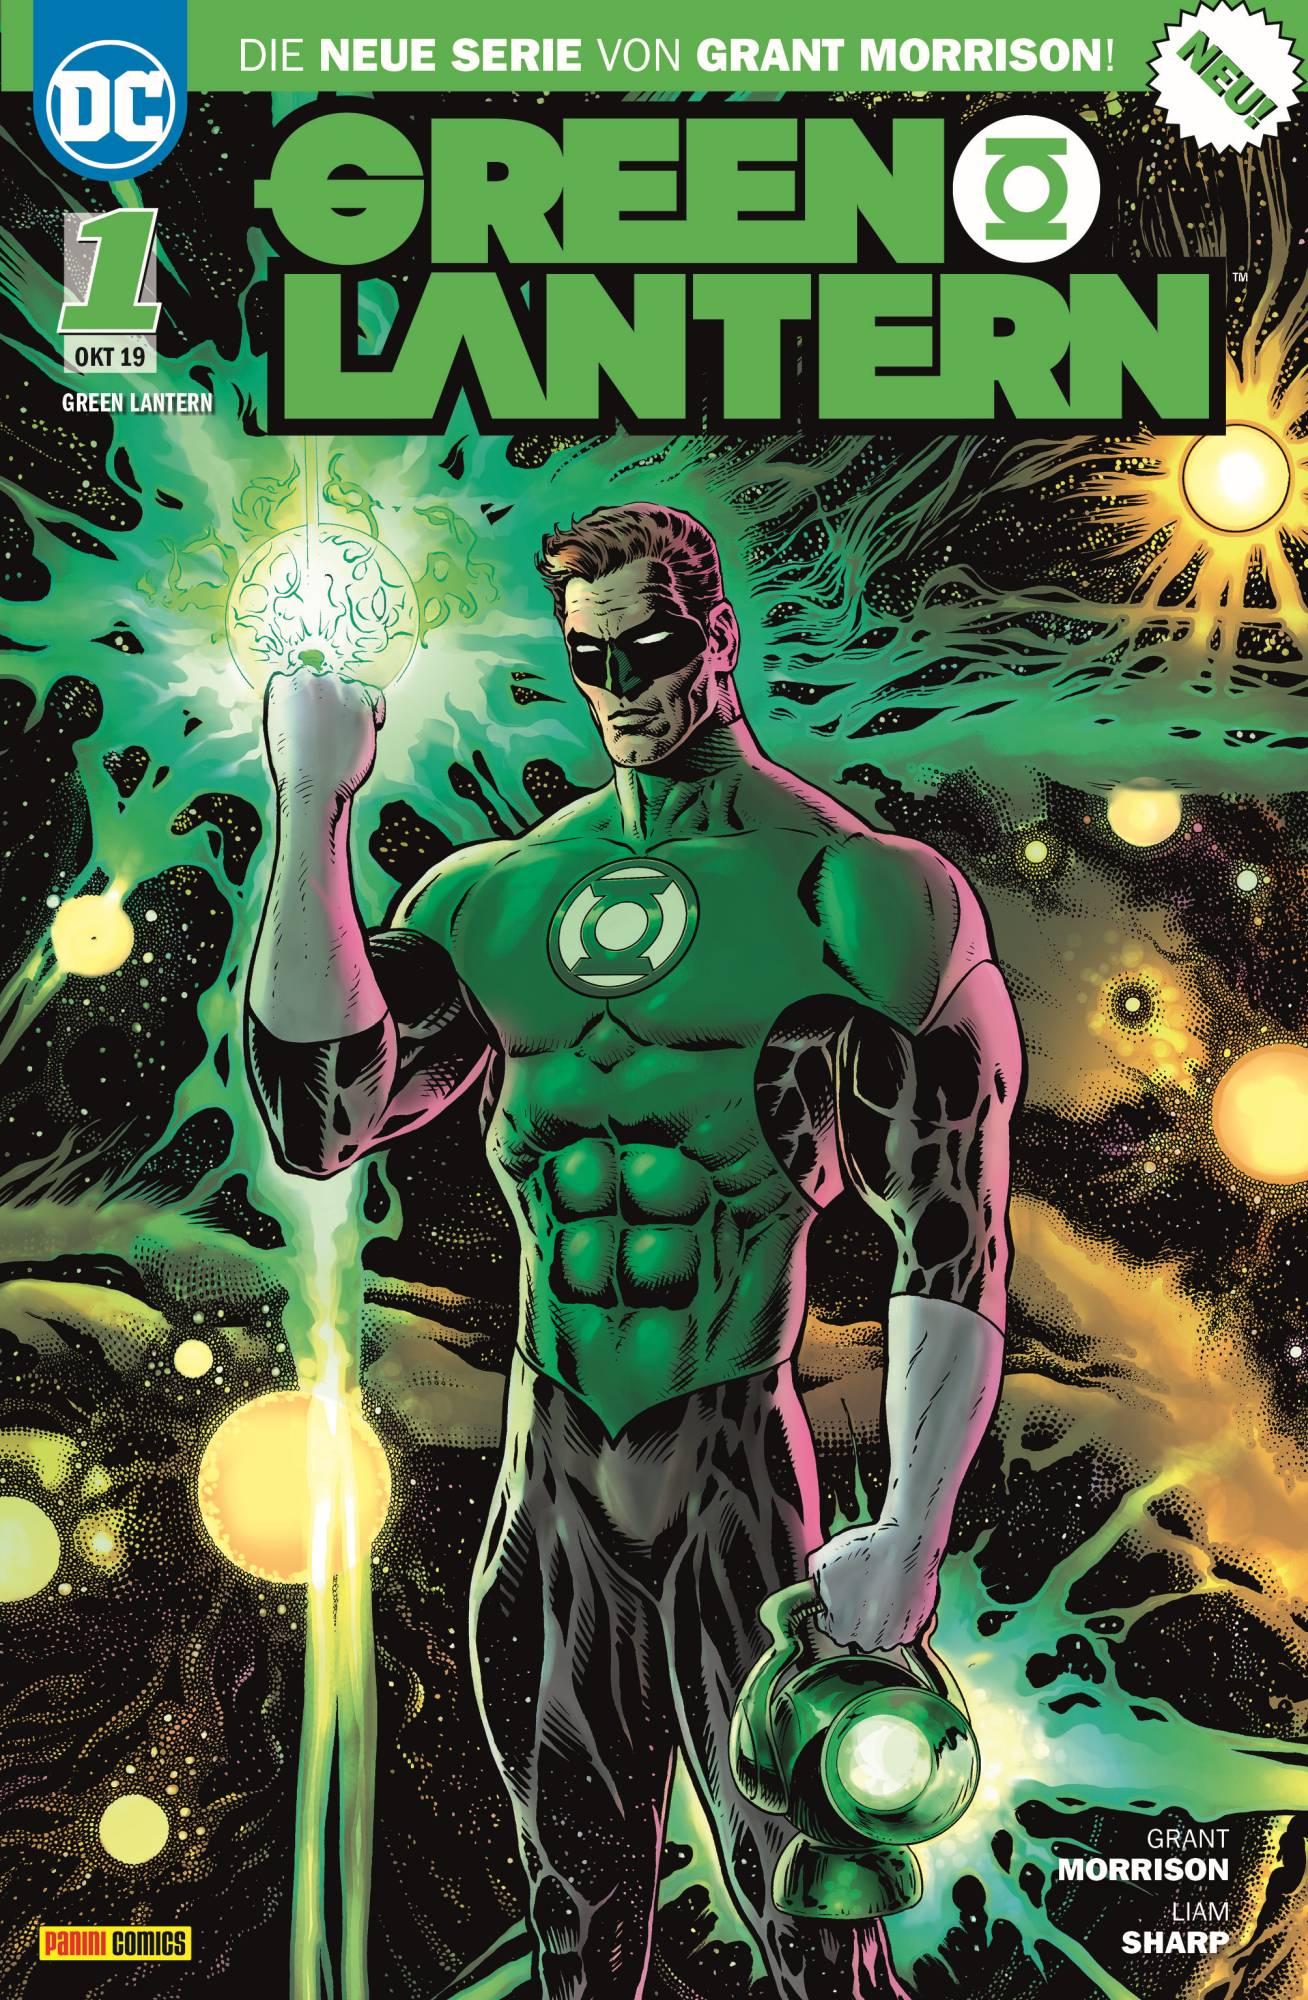 Green Lantern Bd. 1 - Pfad der Finsternis